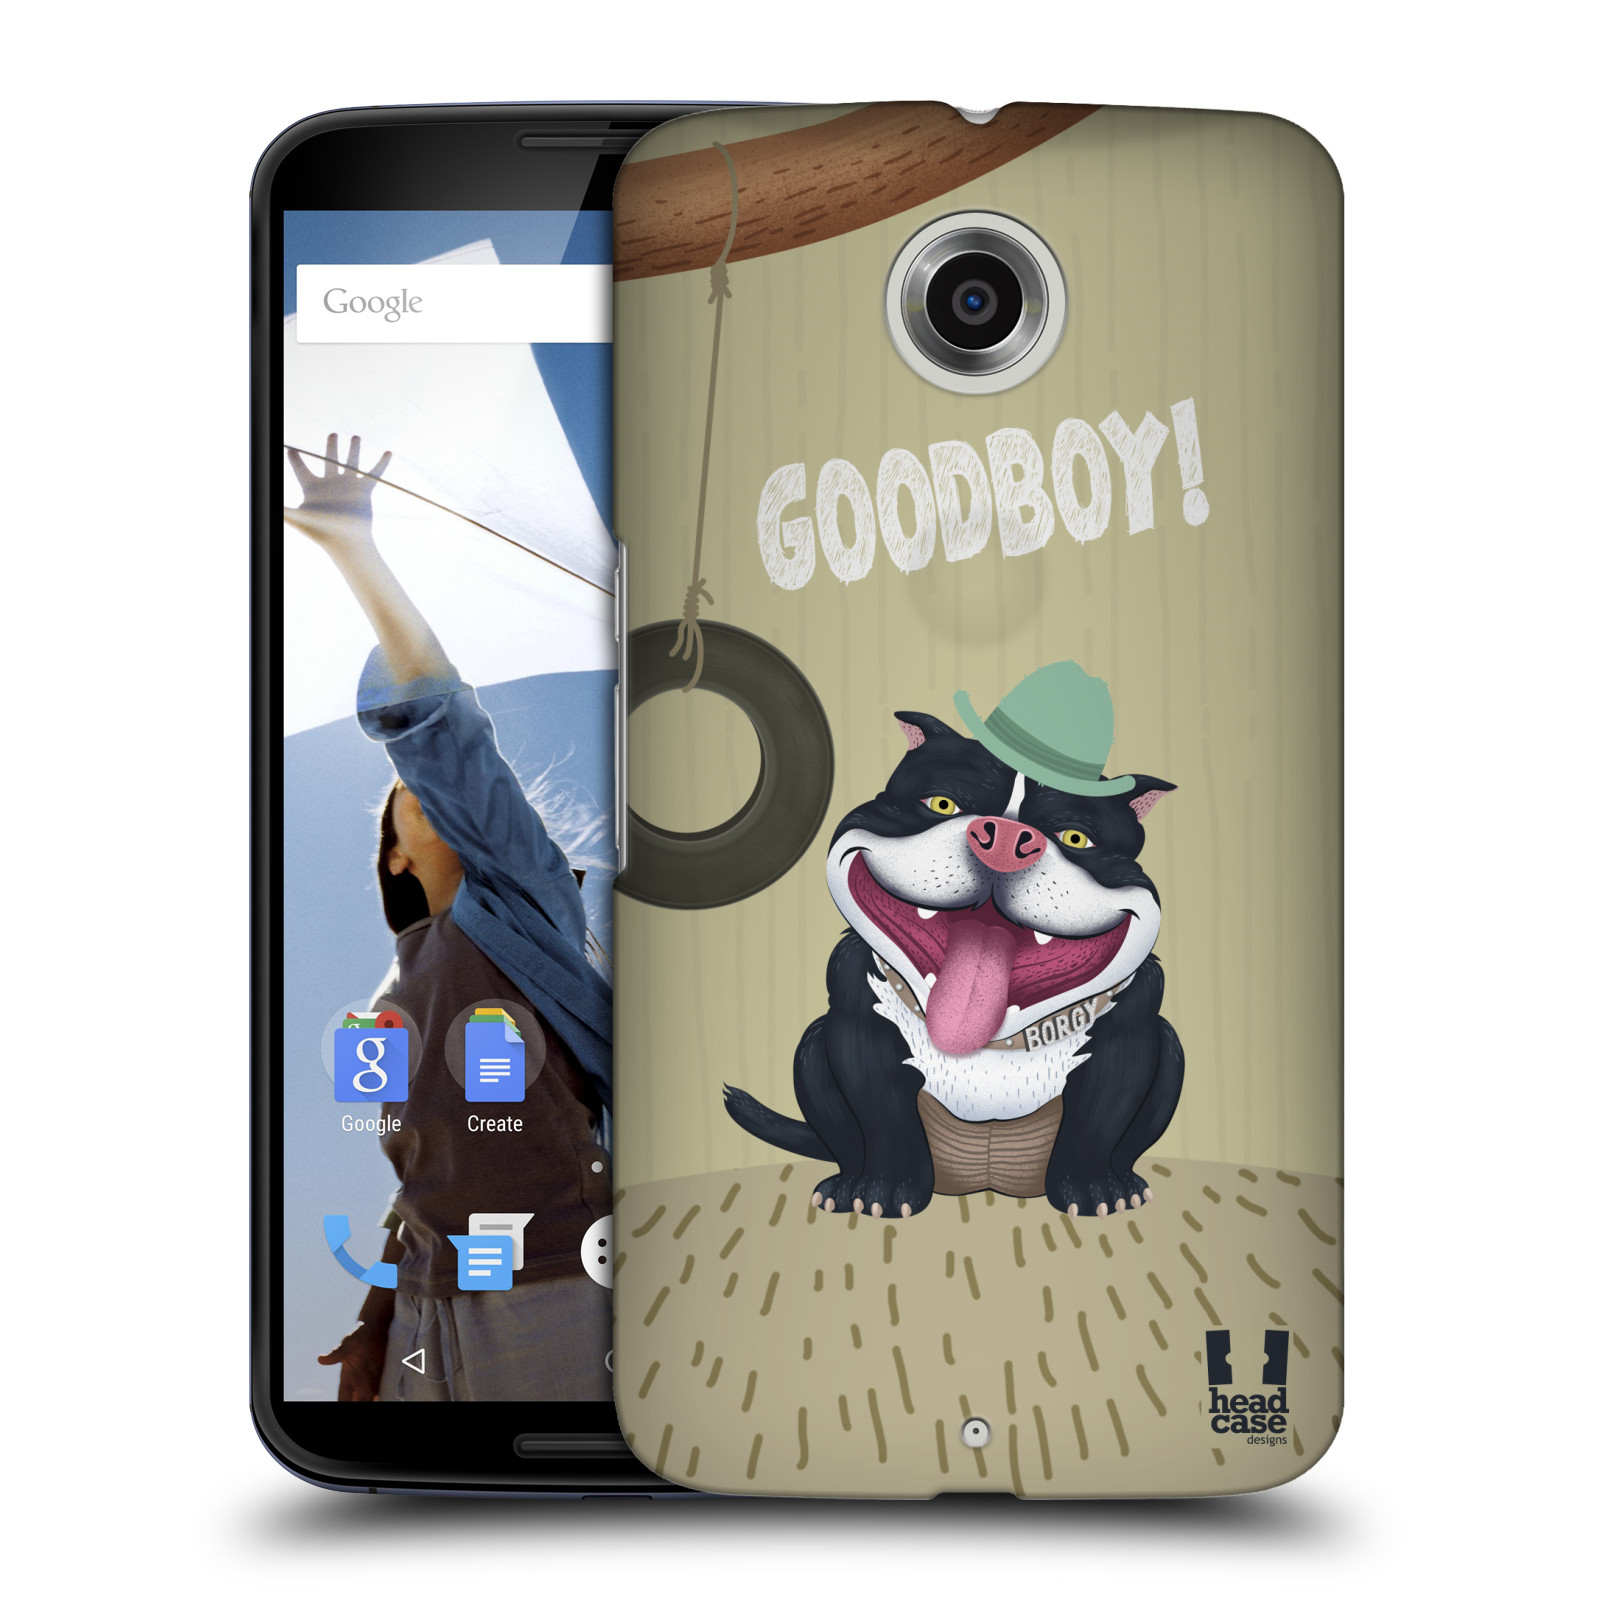 Plastové pouzdro na mobil Motorola Nexus 6 HEAD CASE Goodboy! Pejsek (Kryt či obal na mobilní telefon Motorola Nexus 6)